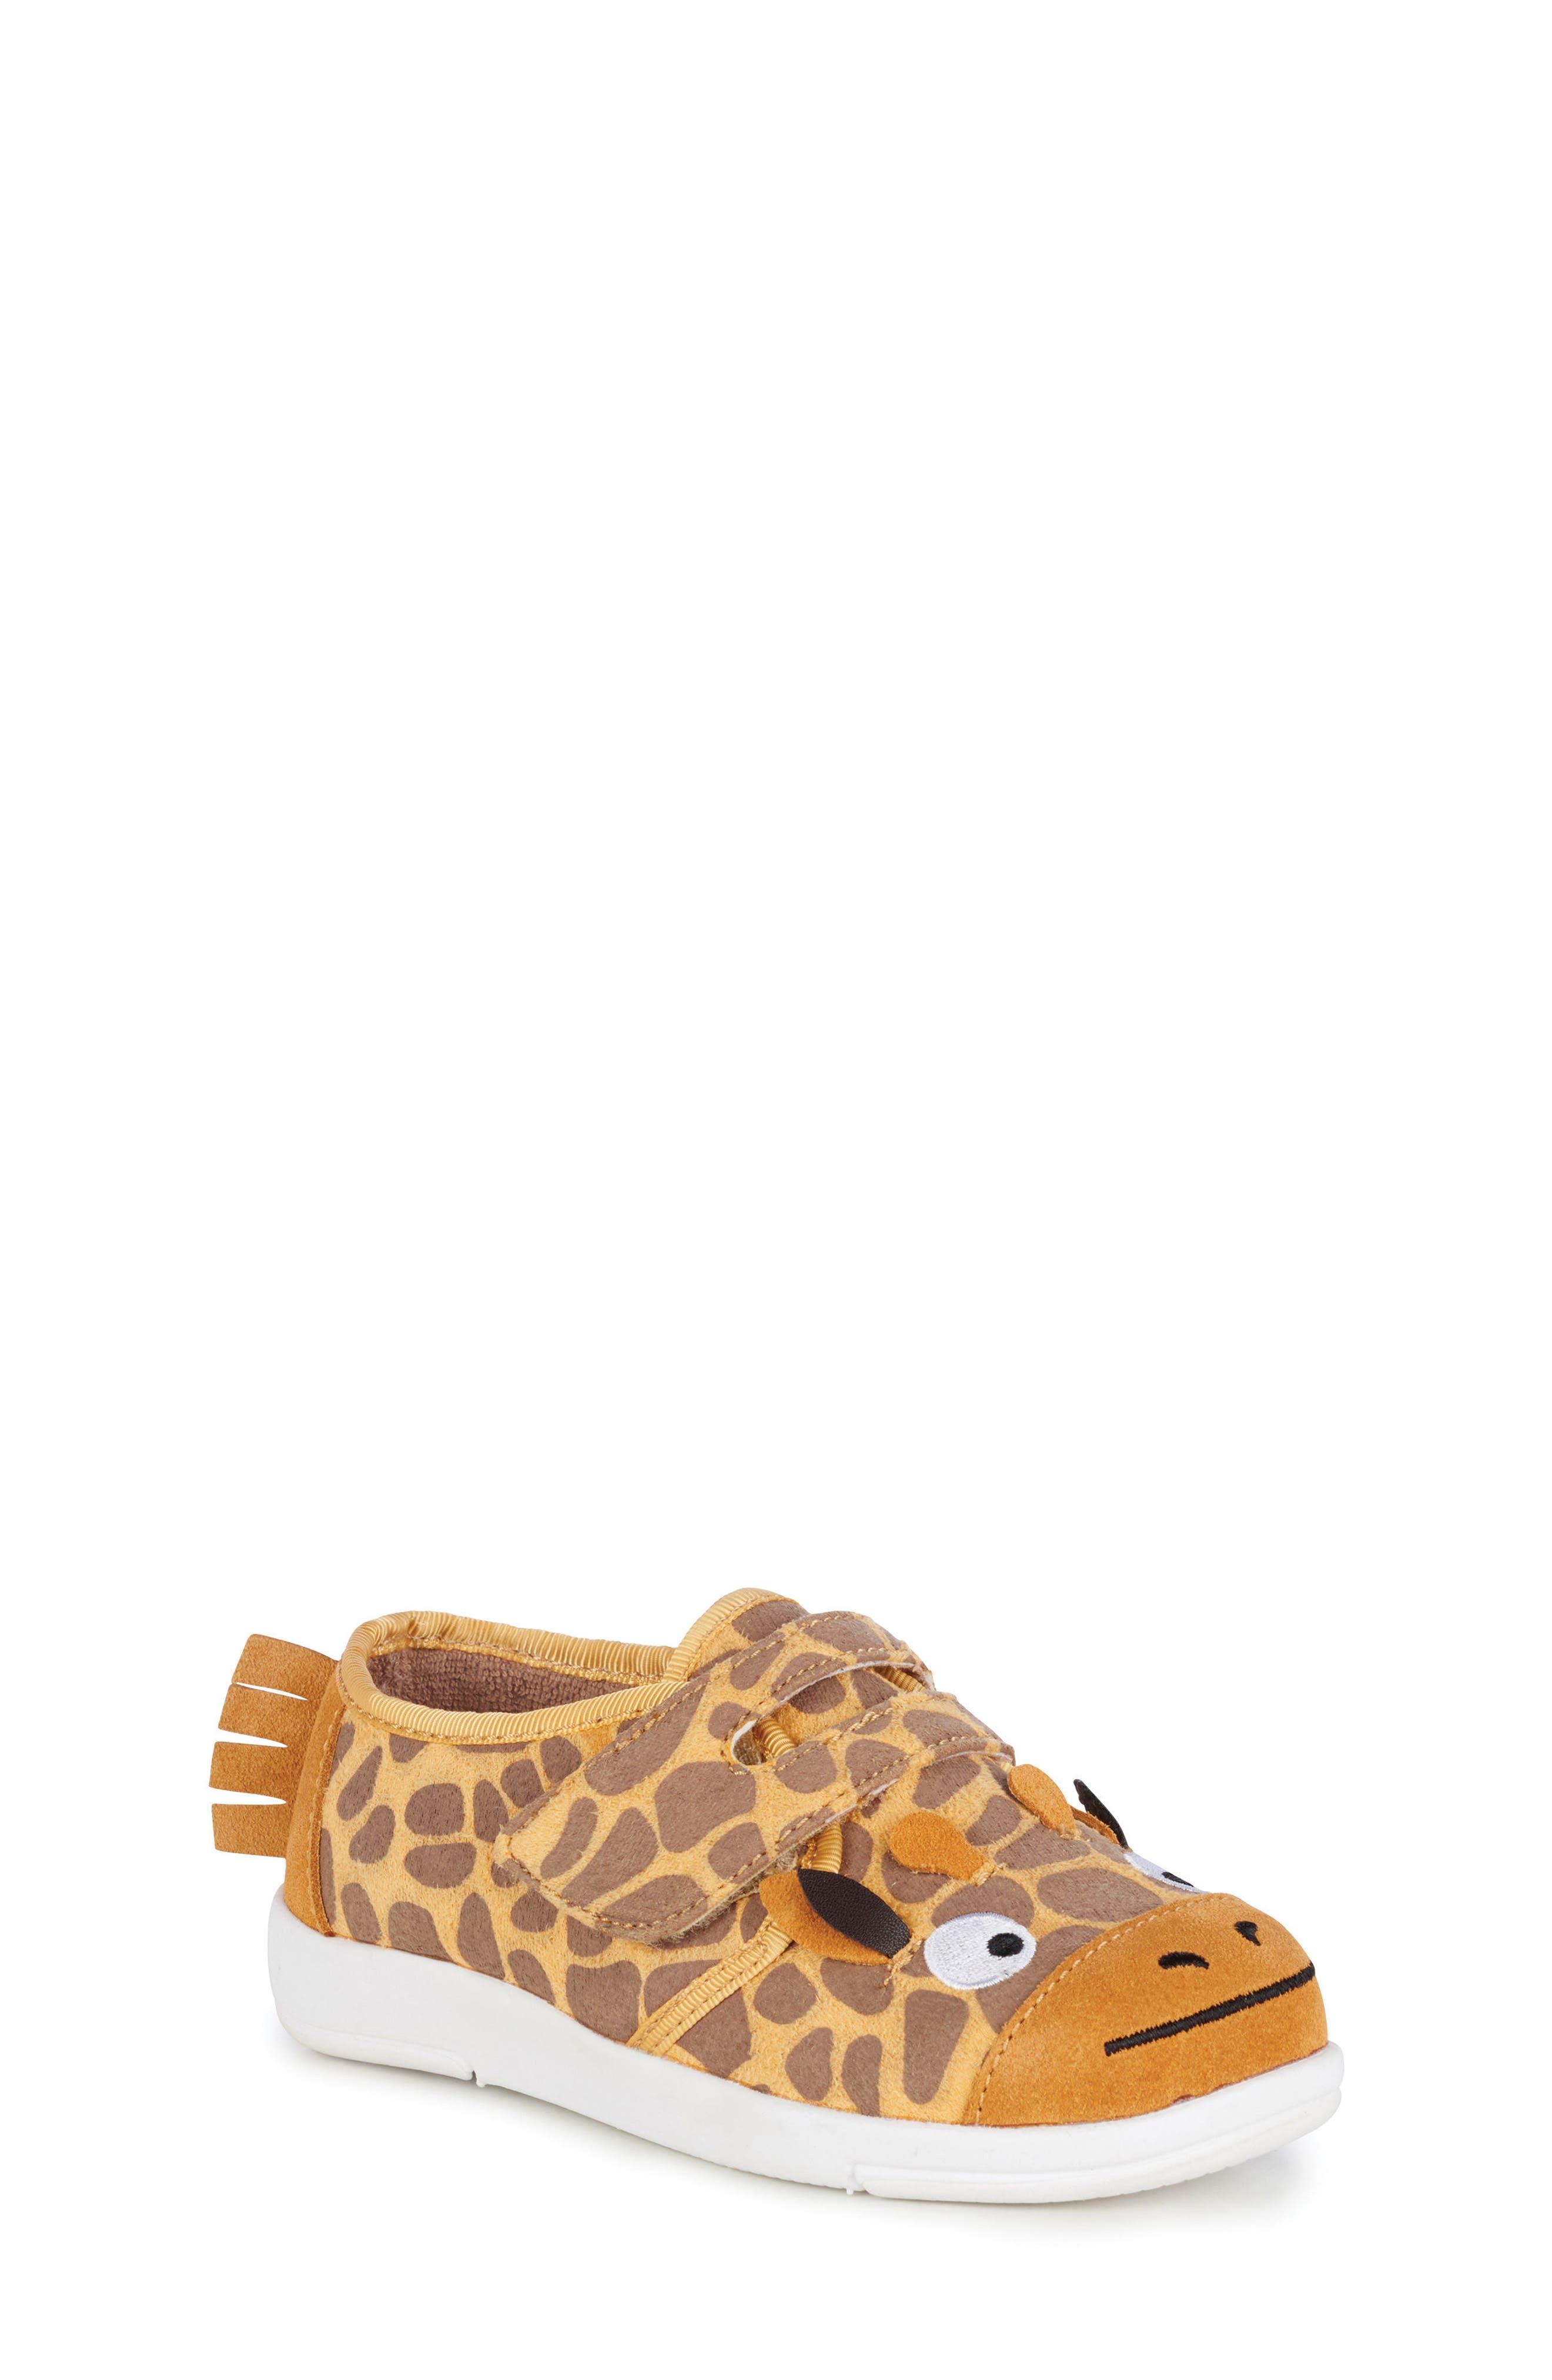 Giraffe Sneaker,                             Main thumbnail 1, color,                             700